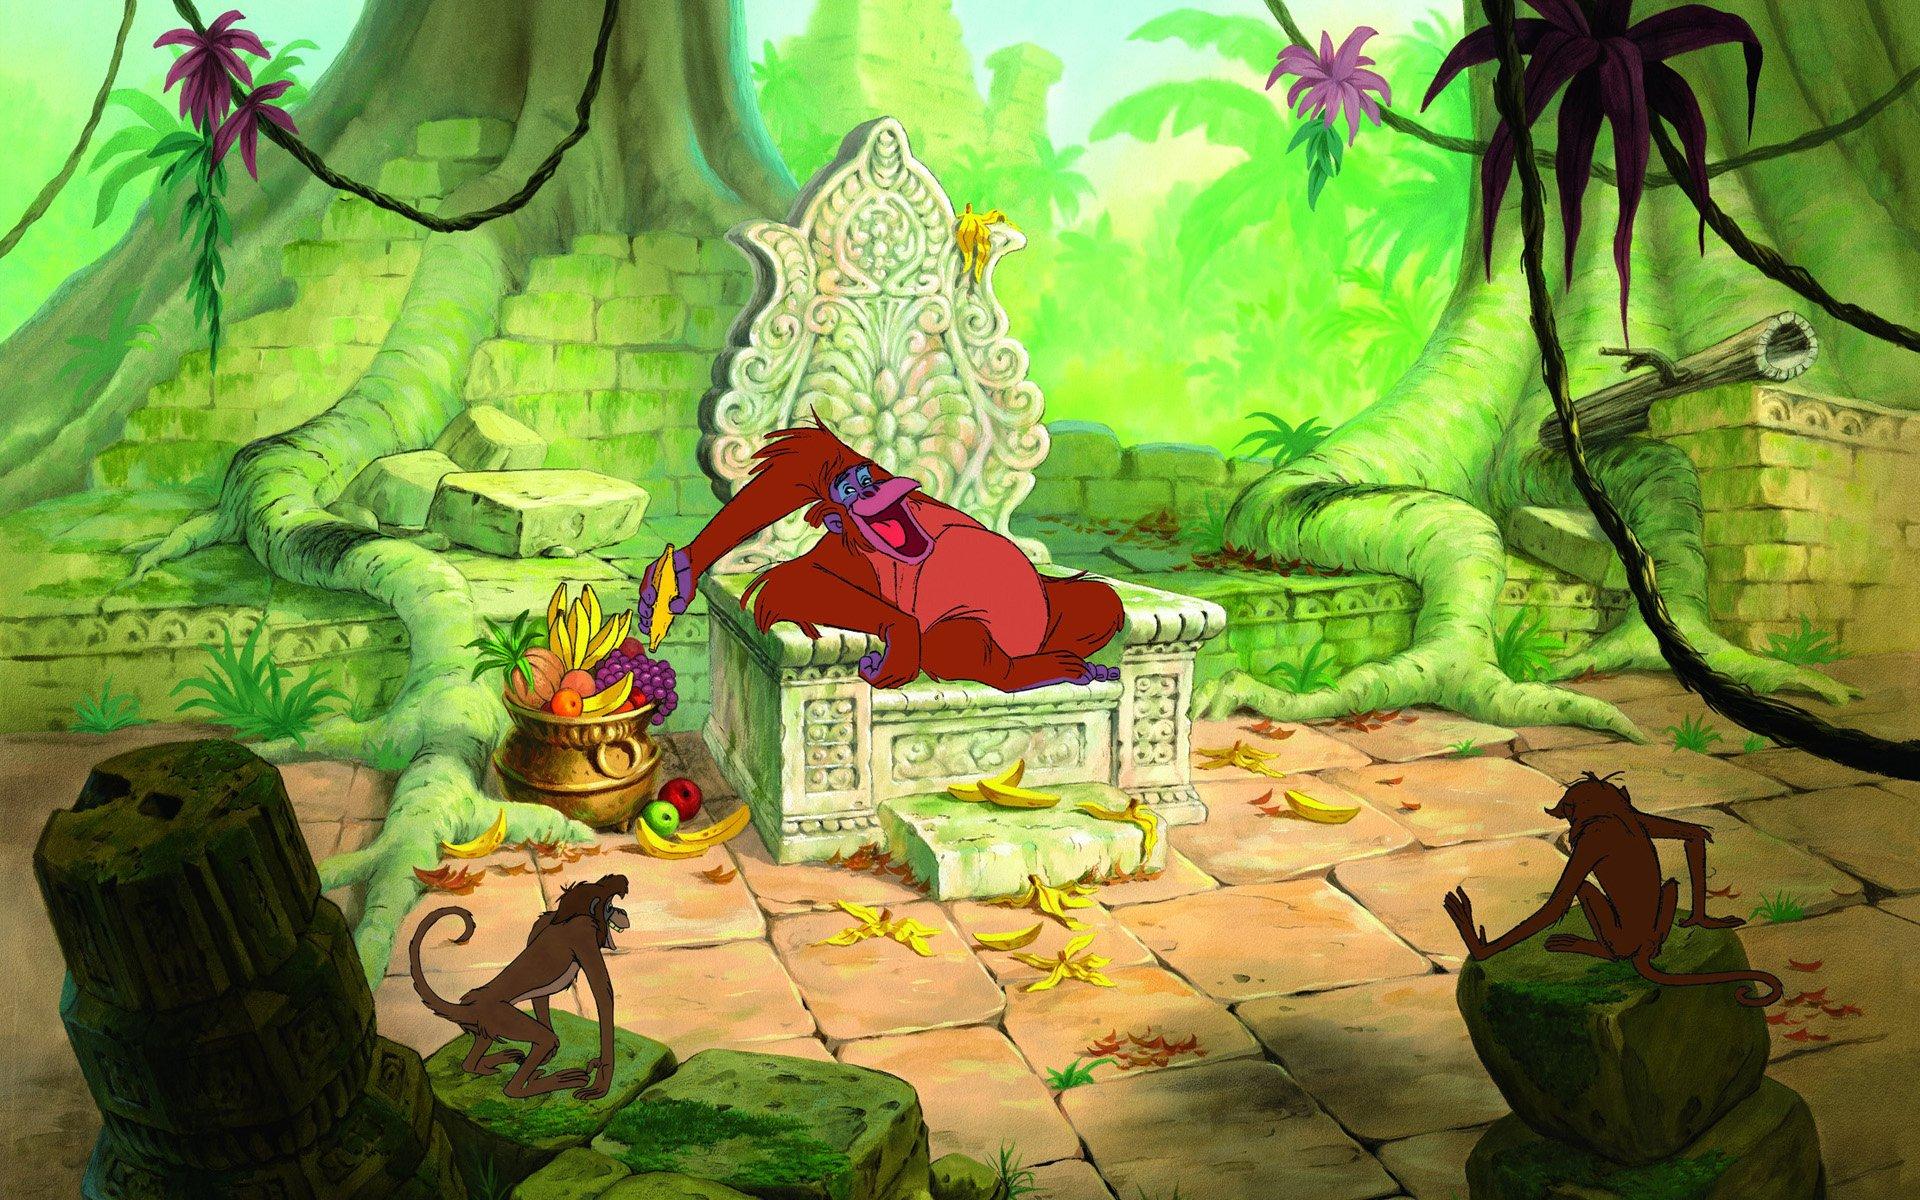 The Jungle Book Hd Wallpaper